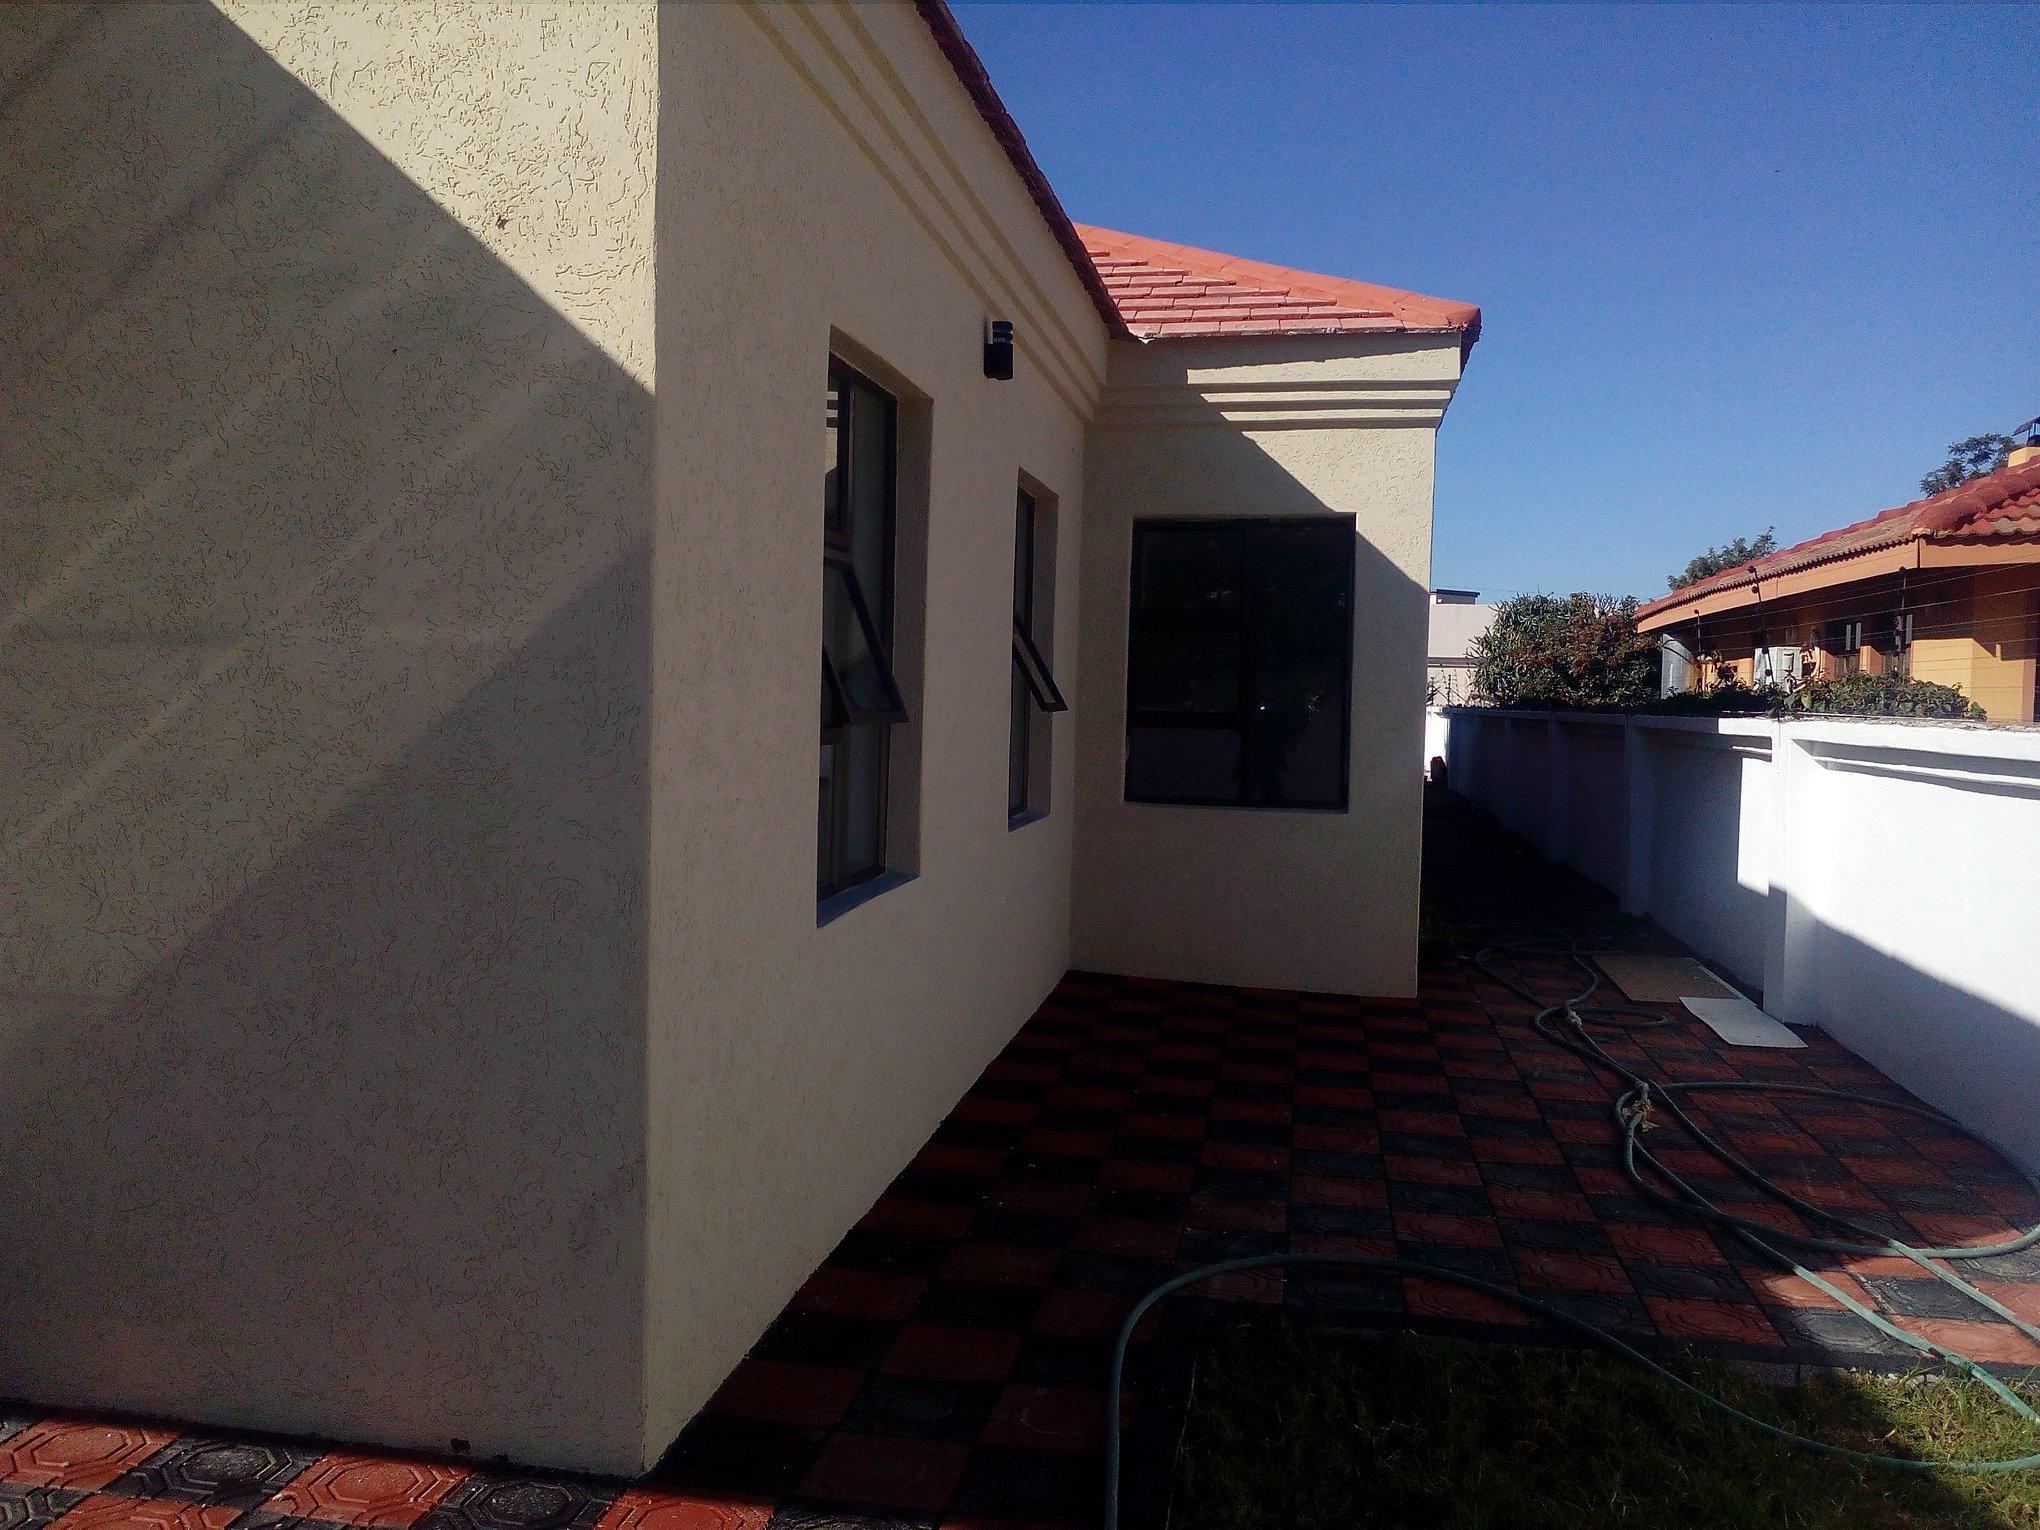 Phakalane Gaborone 4 Bedroom House For Sale Impact